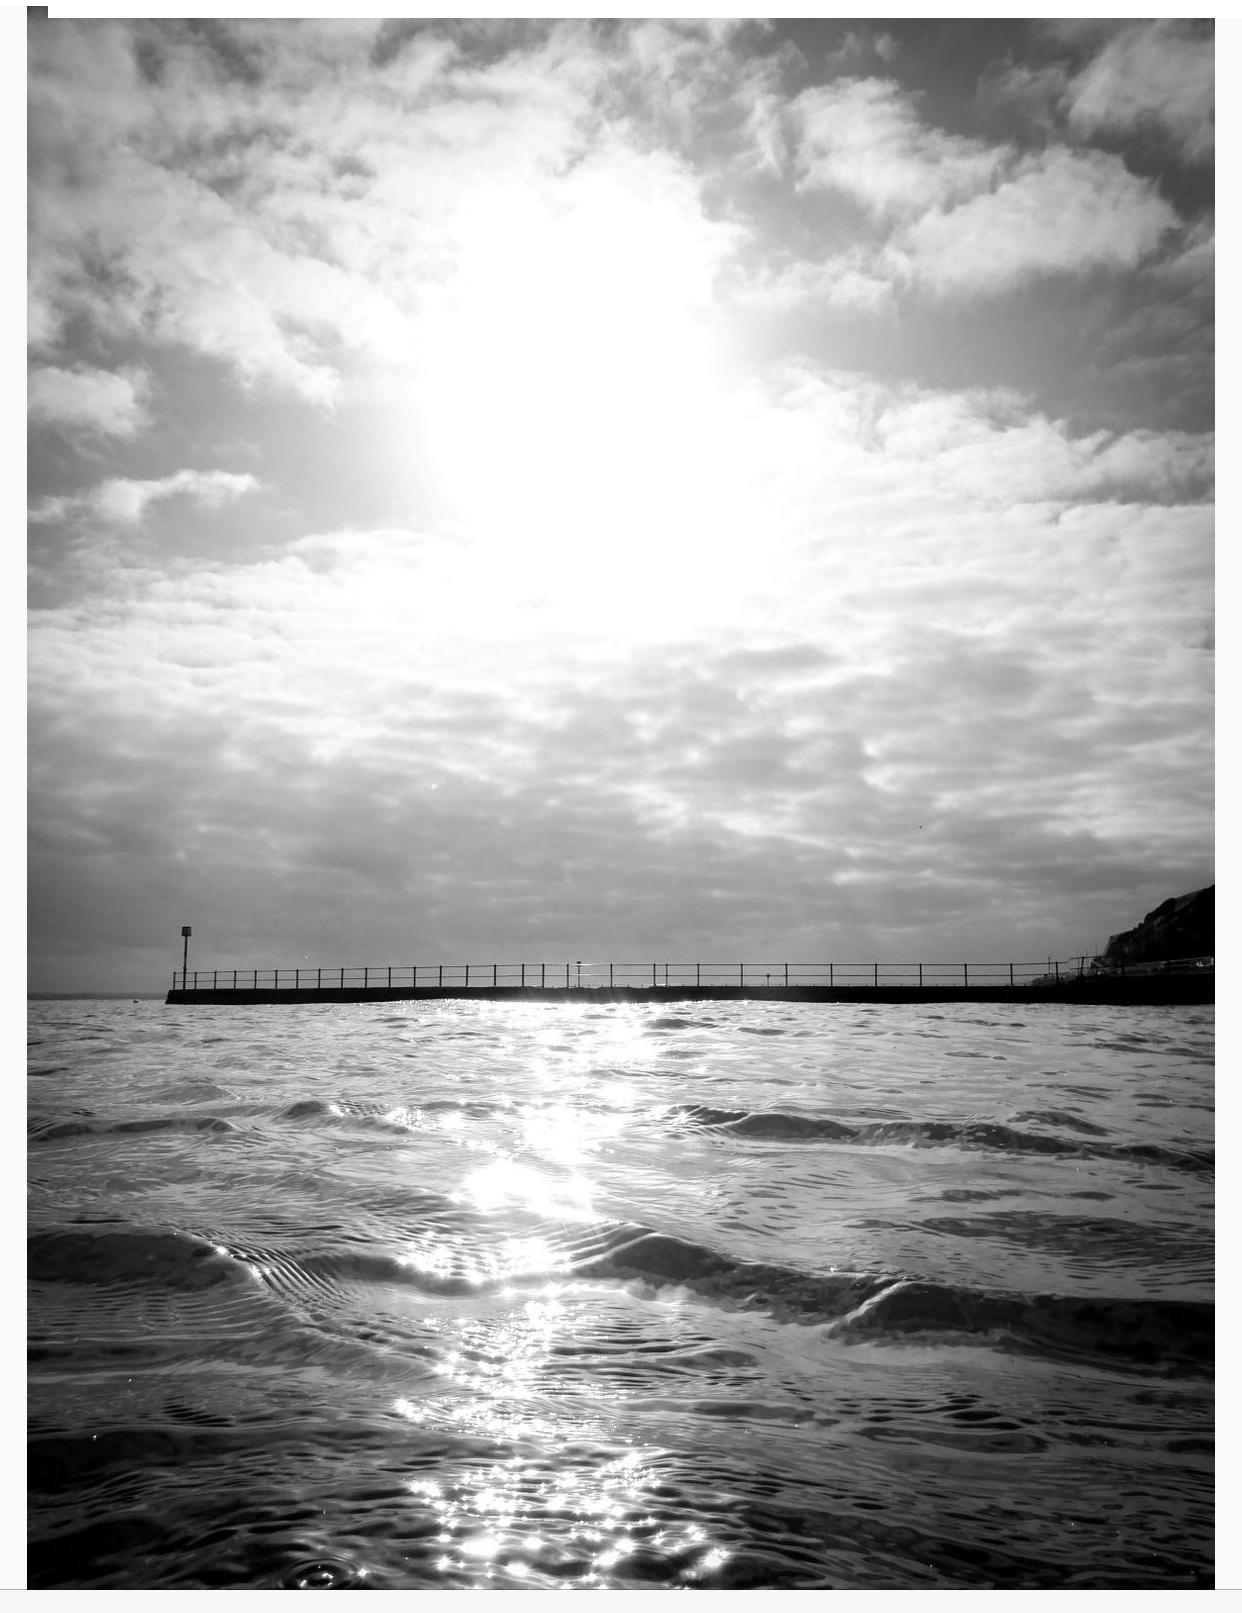 Swimming in the sea in the UK-f60d25e0-e71d-4152-b496-bda3bd994ce5-jpeg